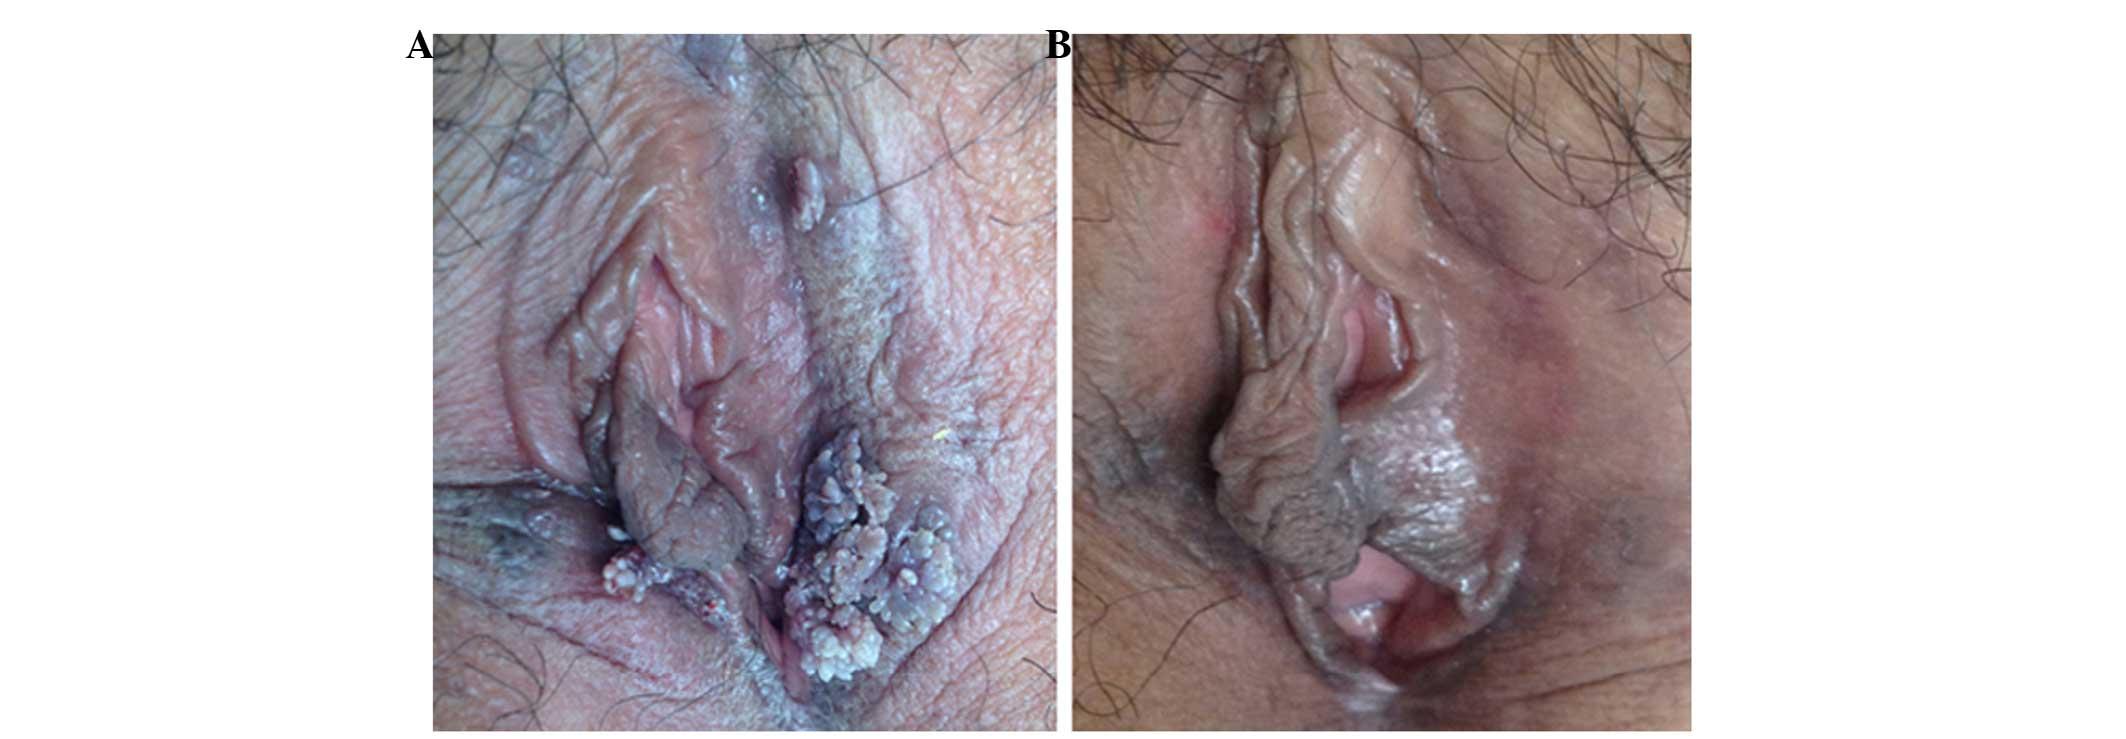 Hpv during pregnancy symptoms